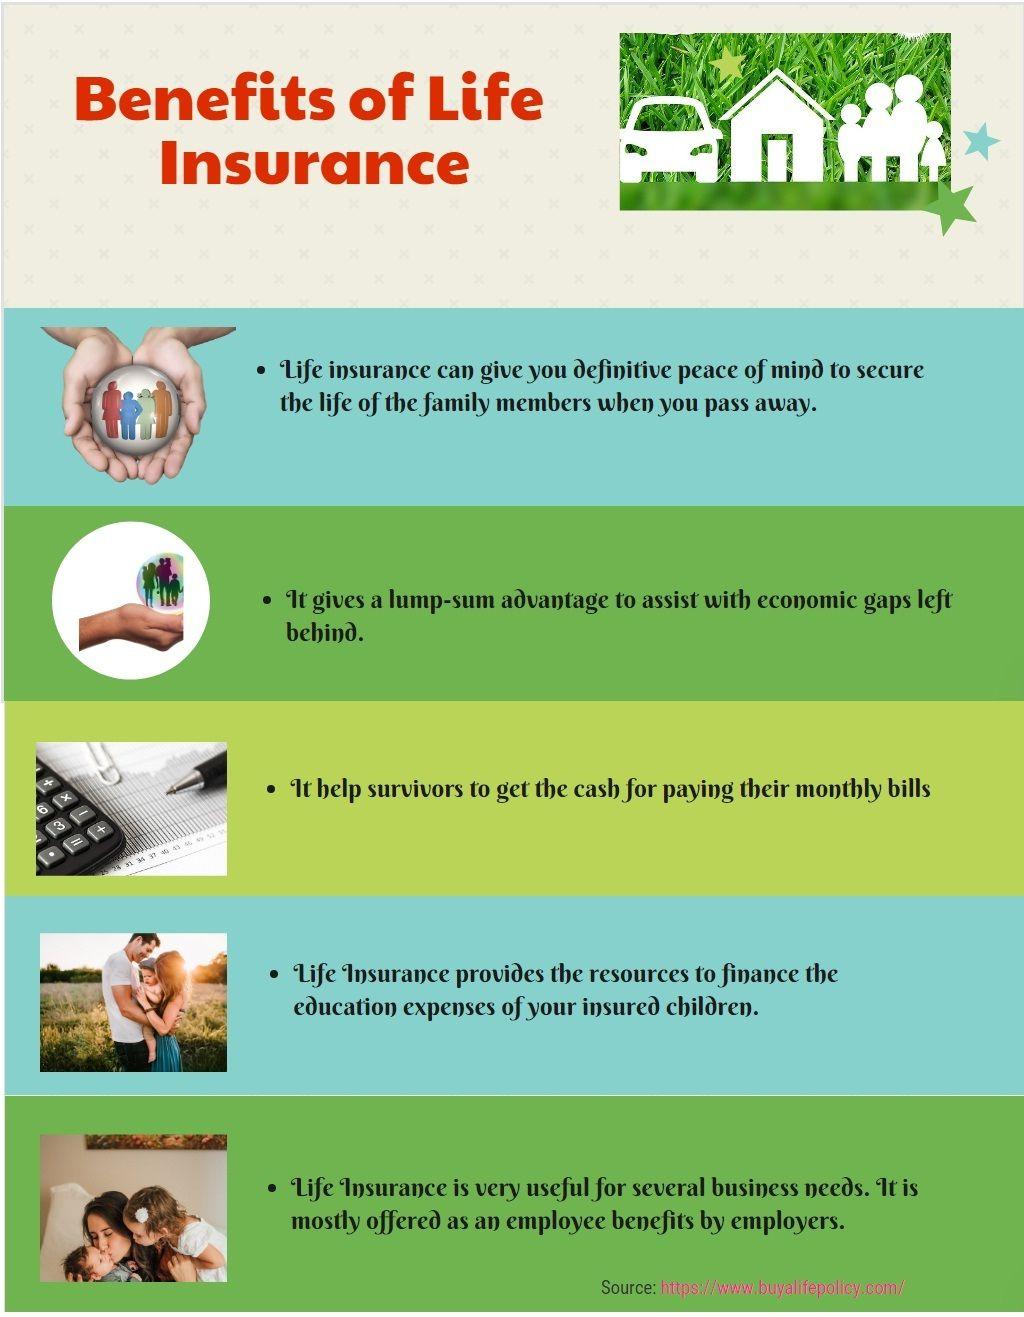 Benefits of life insurance benefits of life insurance